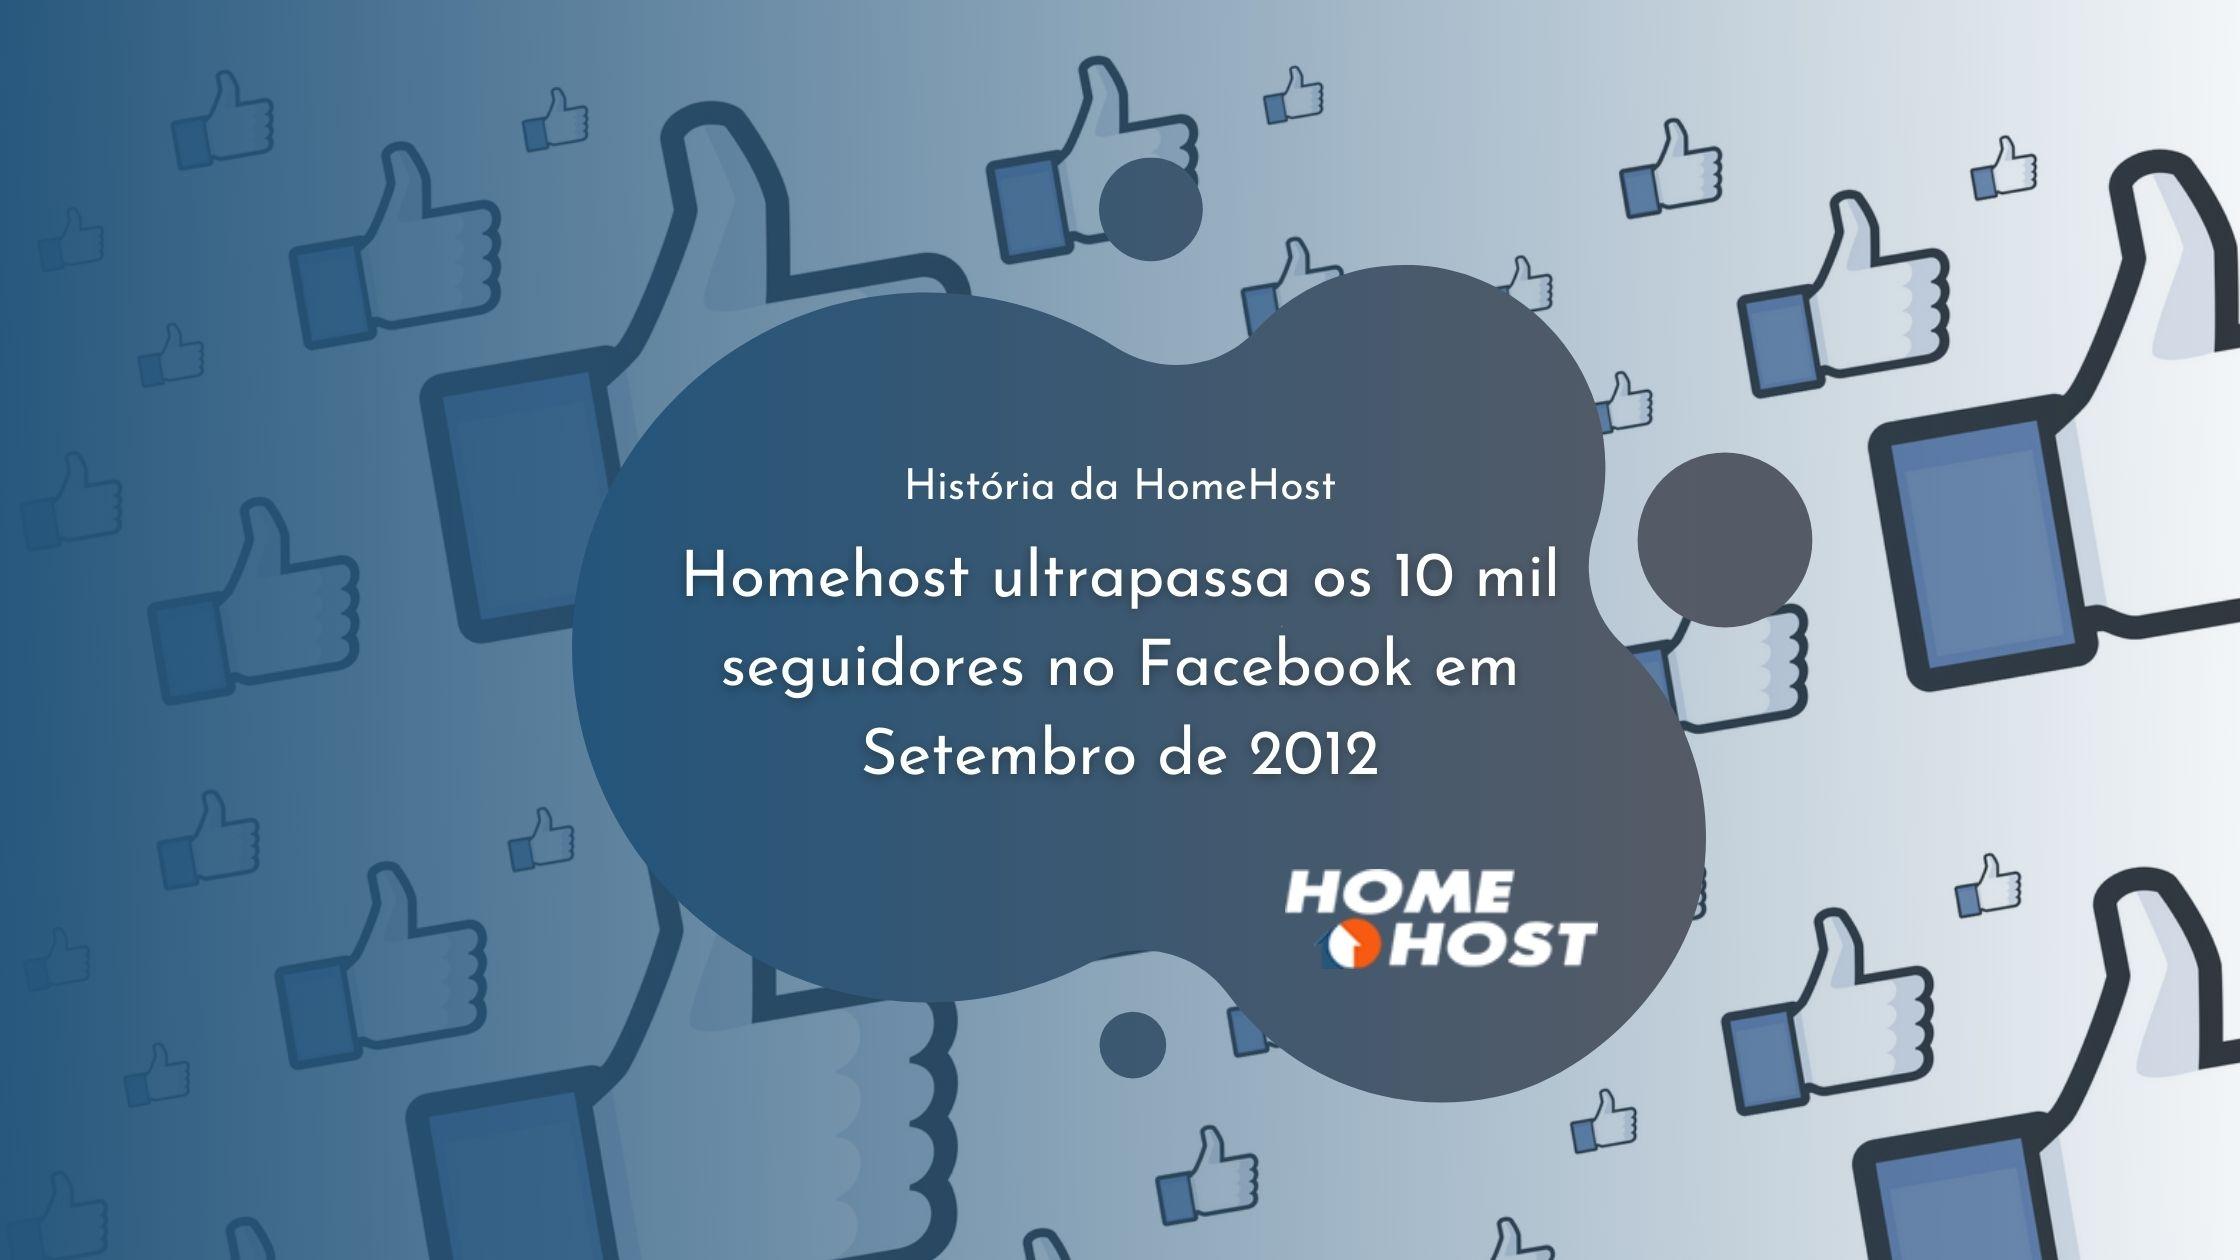 Homehost ultrapassa os 10 mil seguidores no Facebook